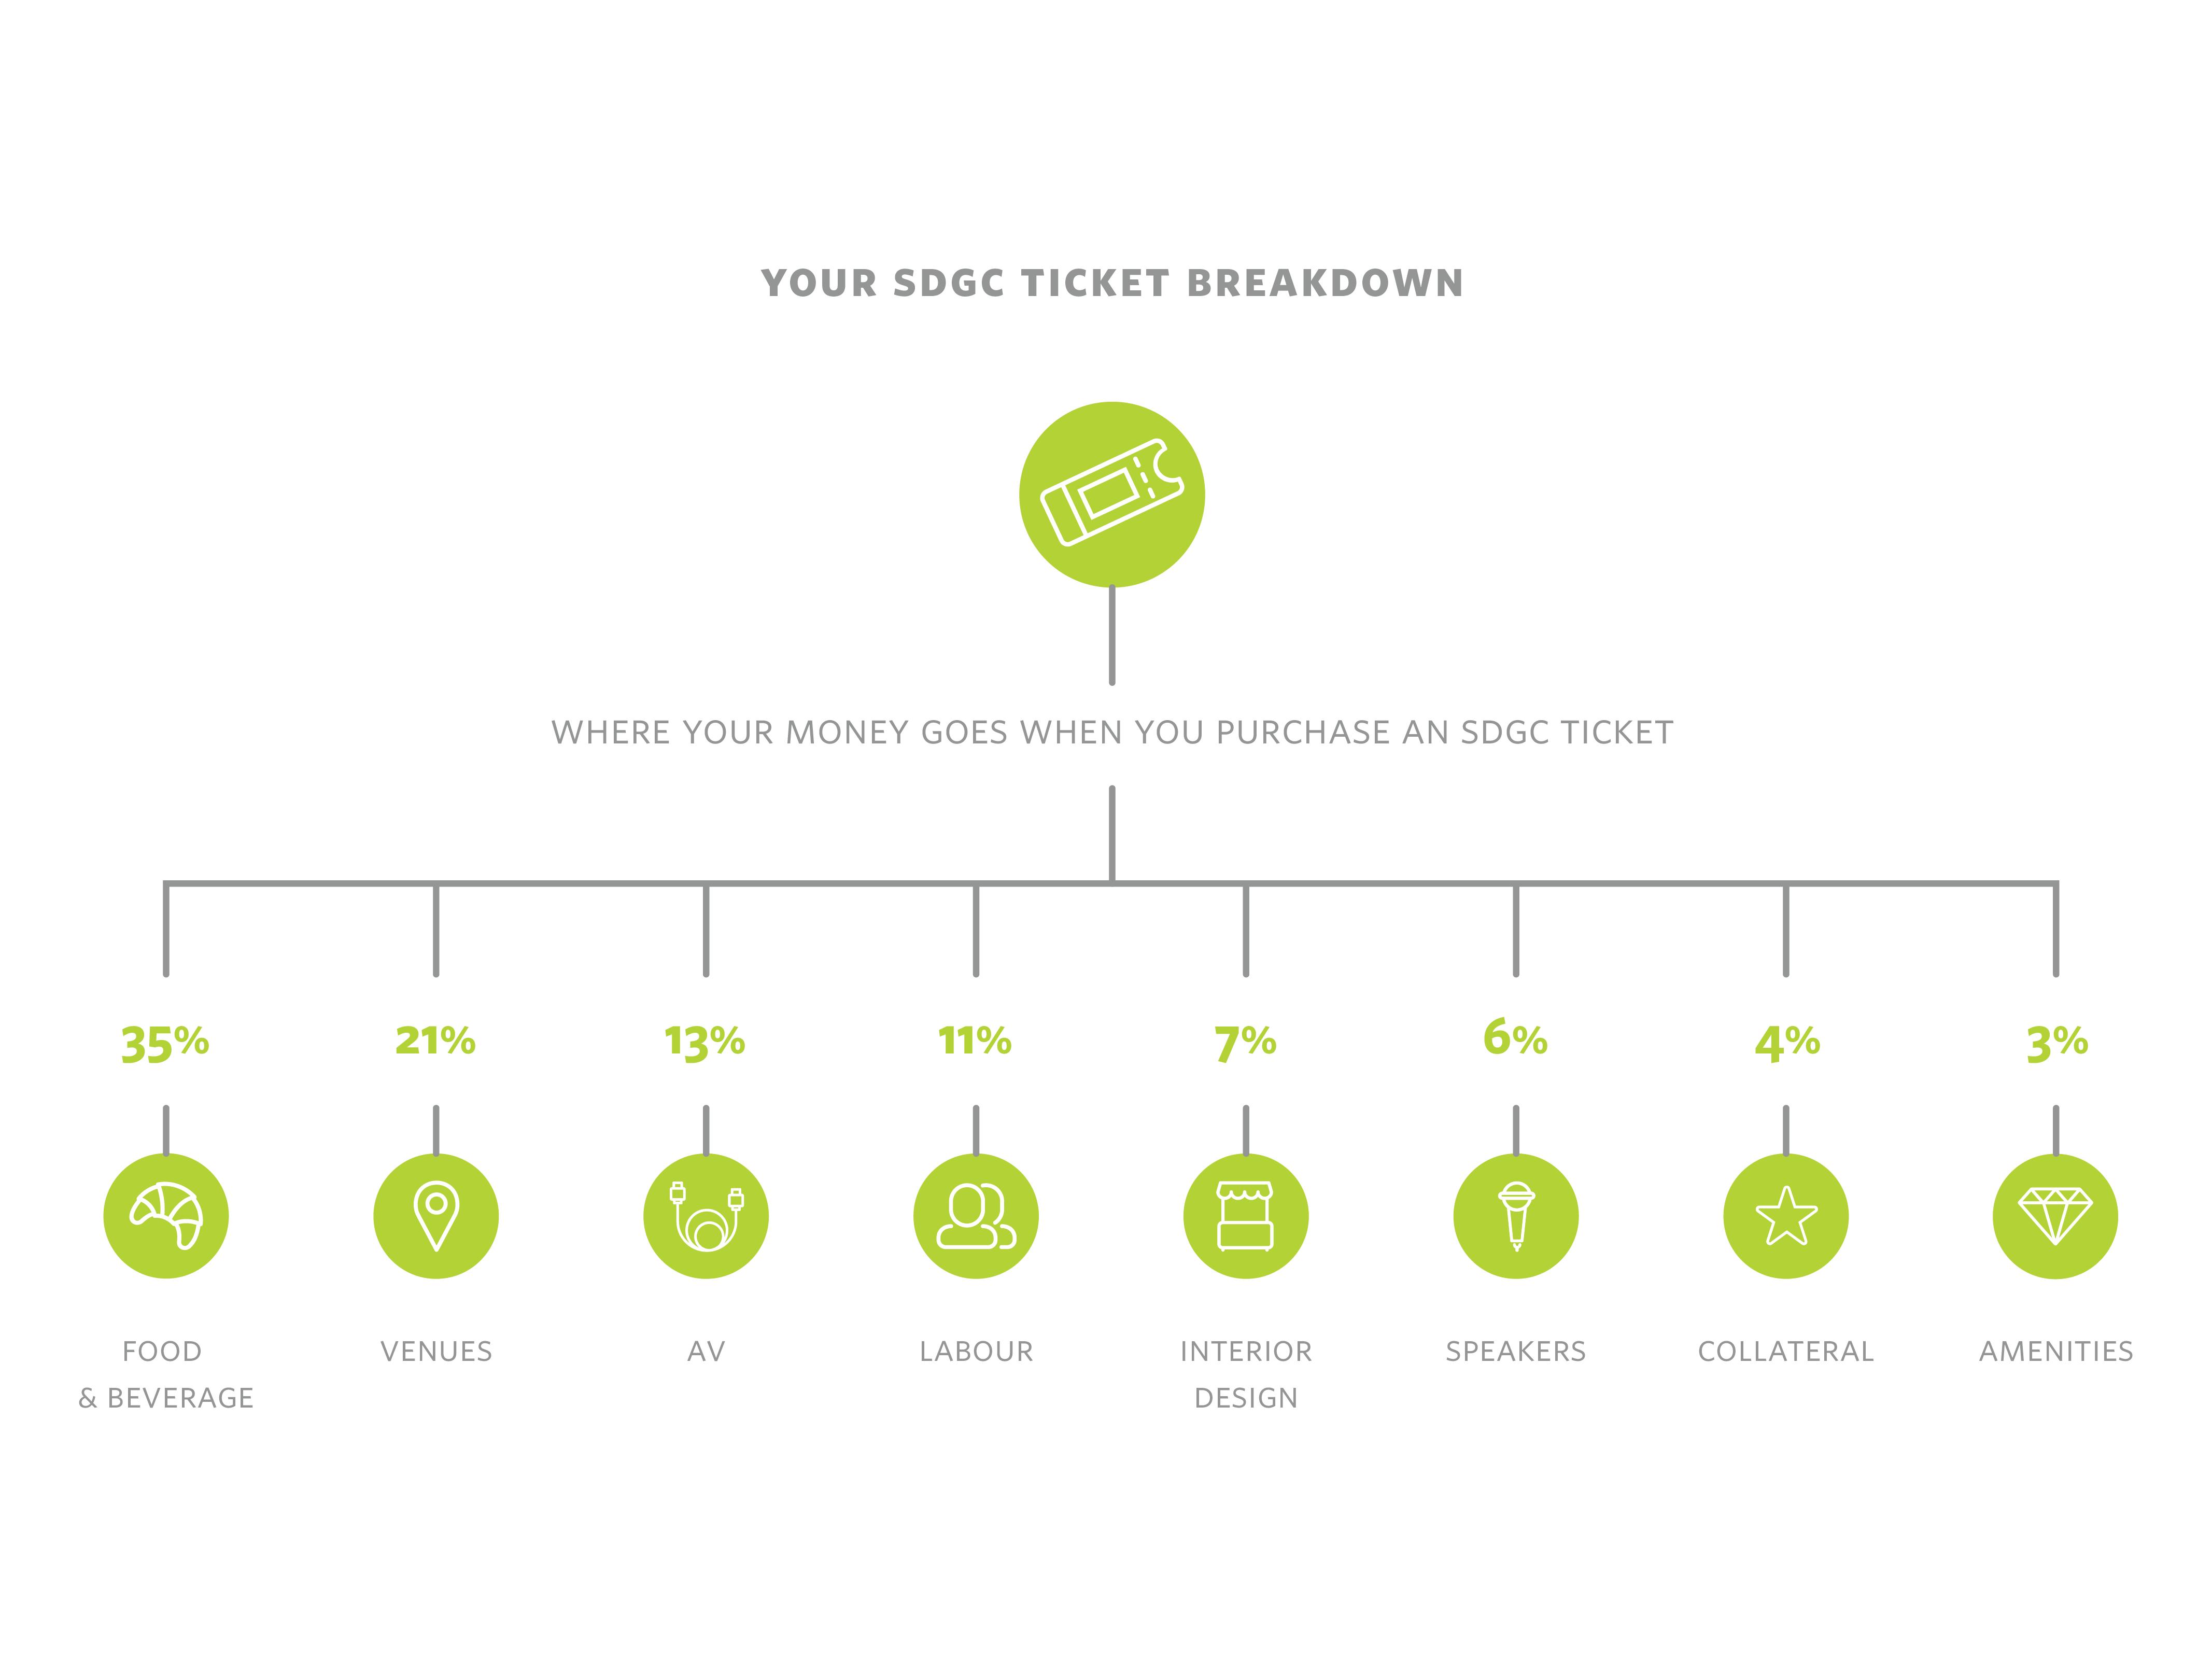 SDGC20 Ticket Breakdown